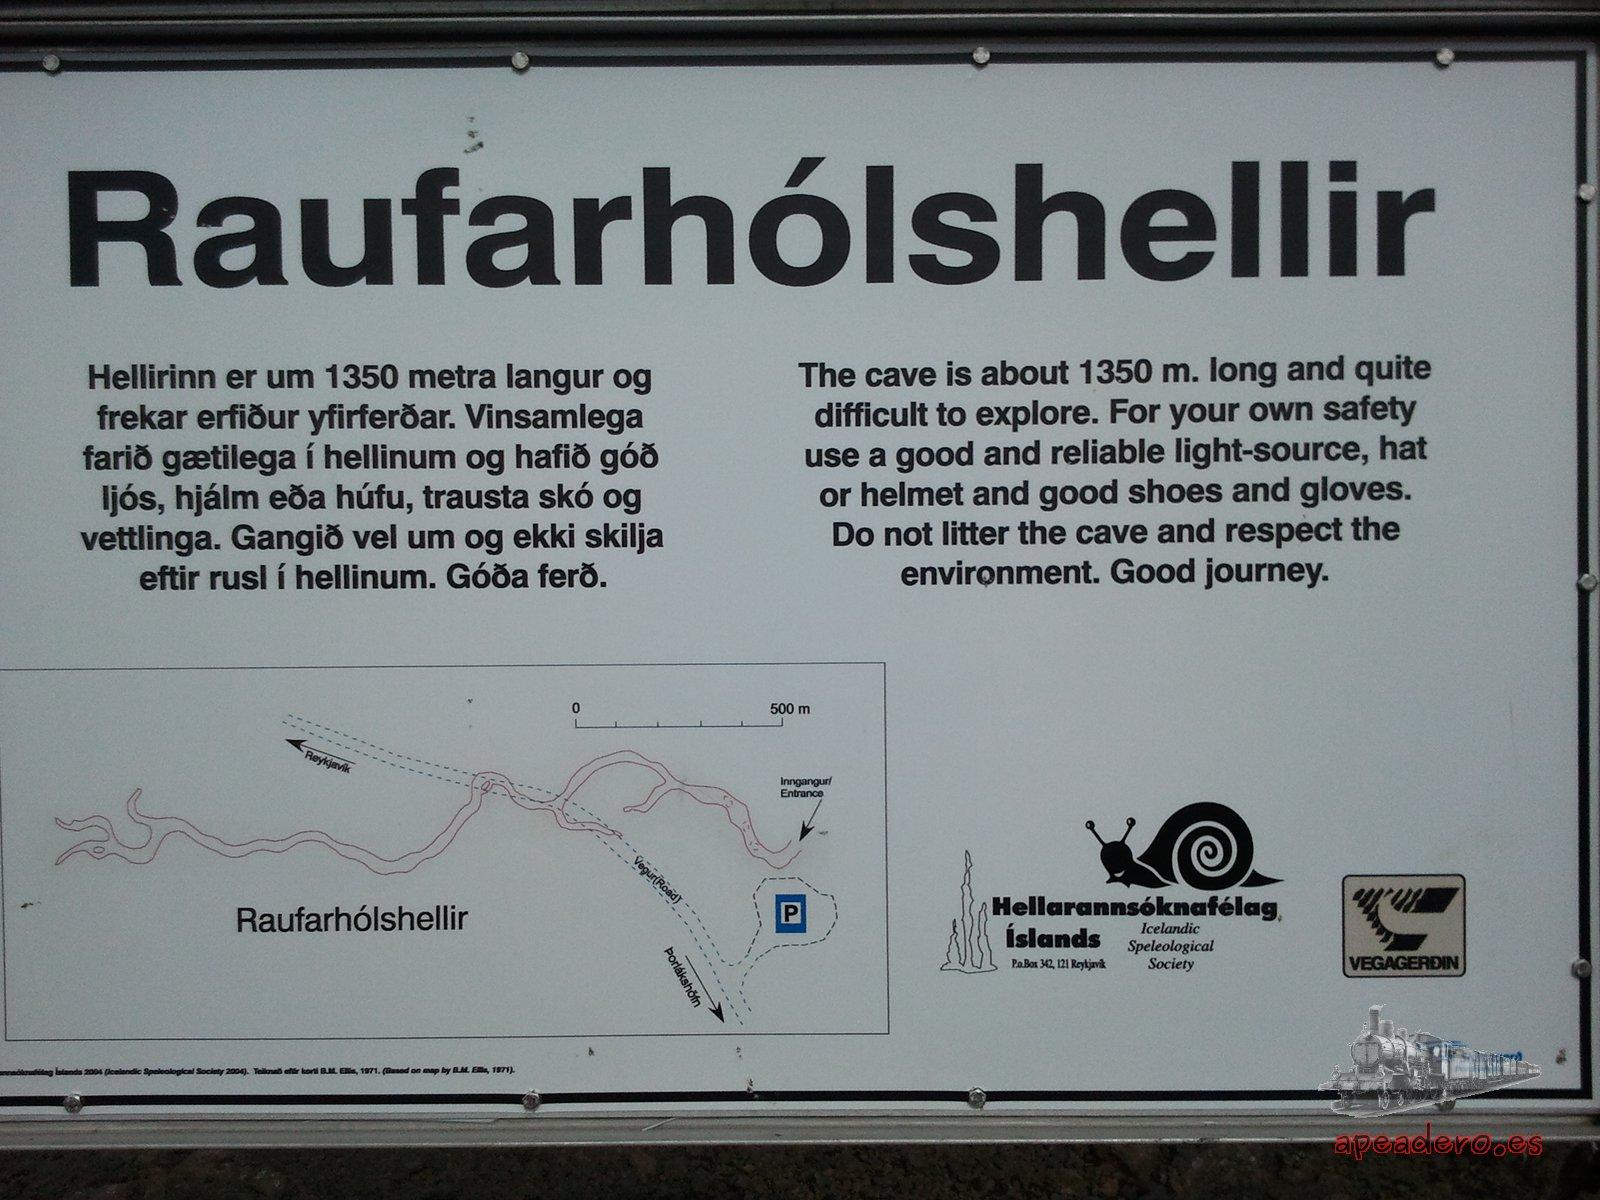 Cartel a la entrada de Raufarholsherllir.